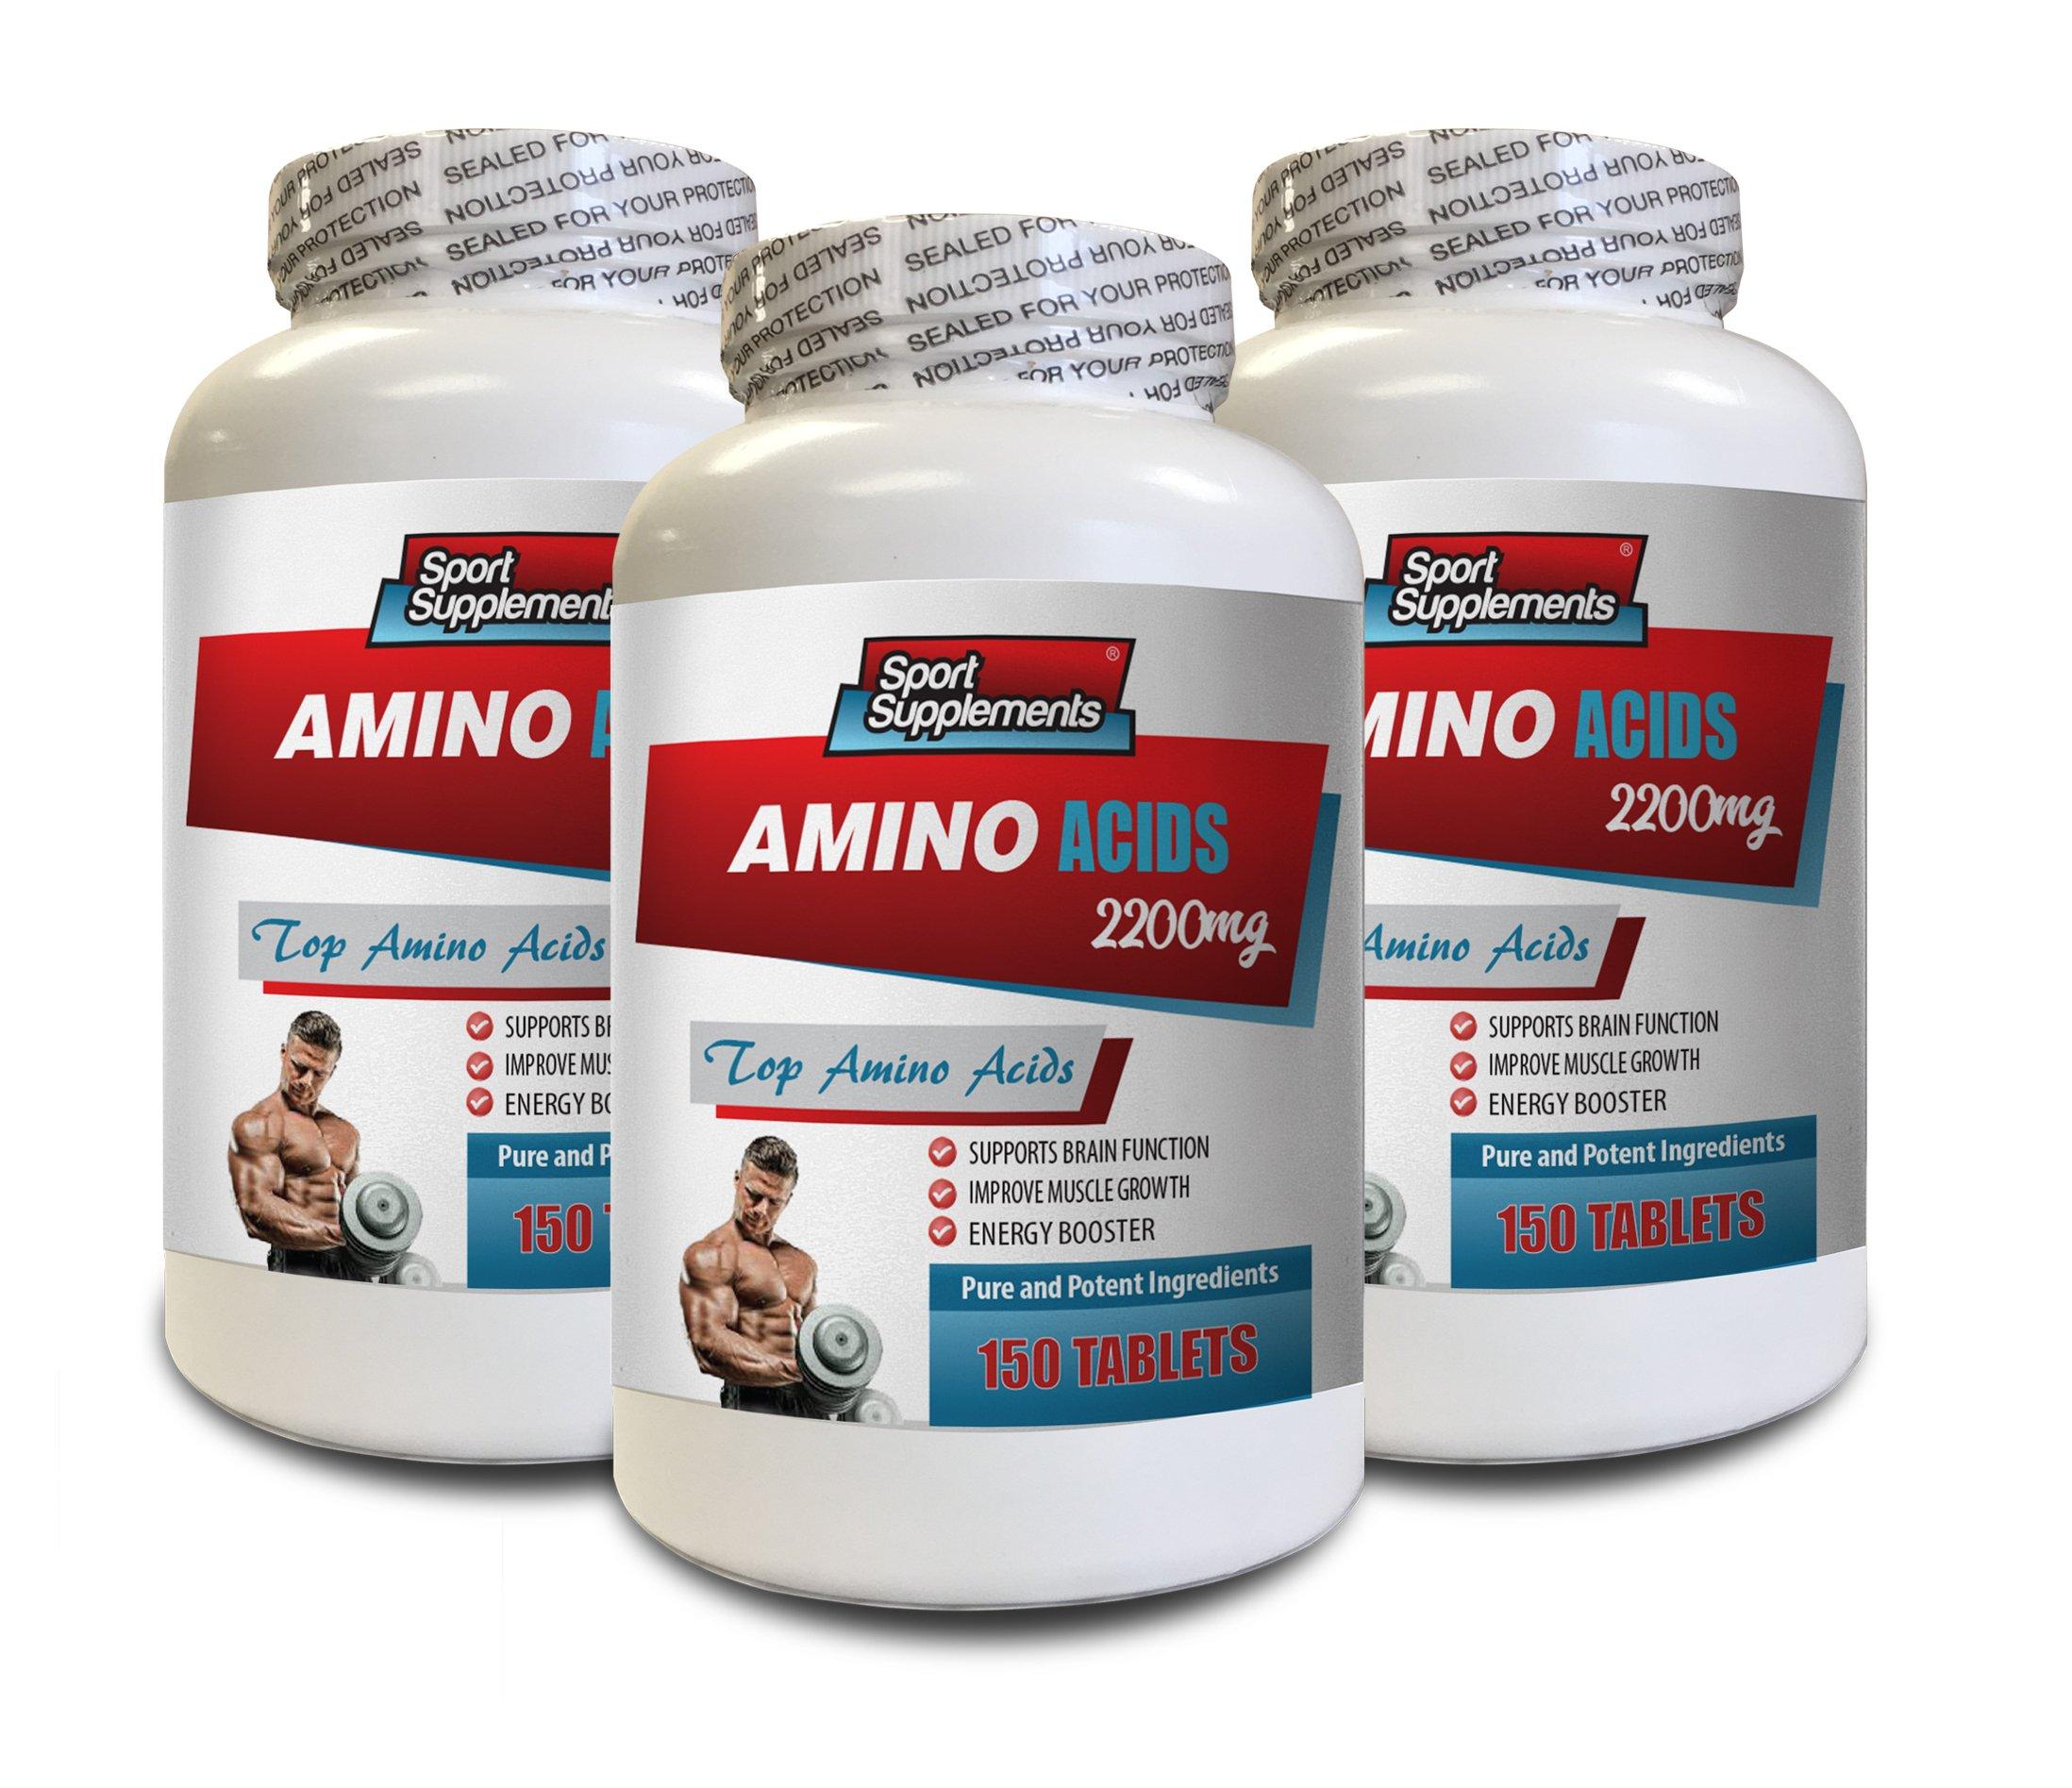 Muscle Mass Builder for Men - TOP Amino Acids 2200 mg - l-Glycine Supplement - 3 Bottles 450 Tablets